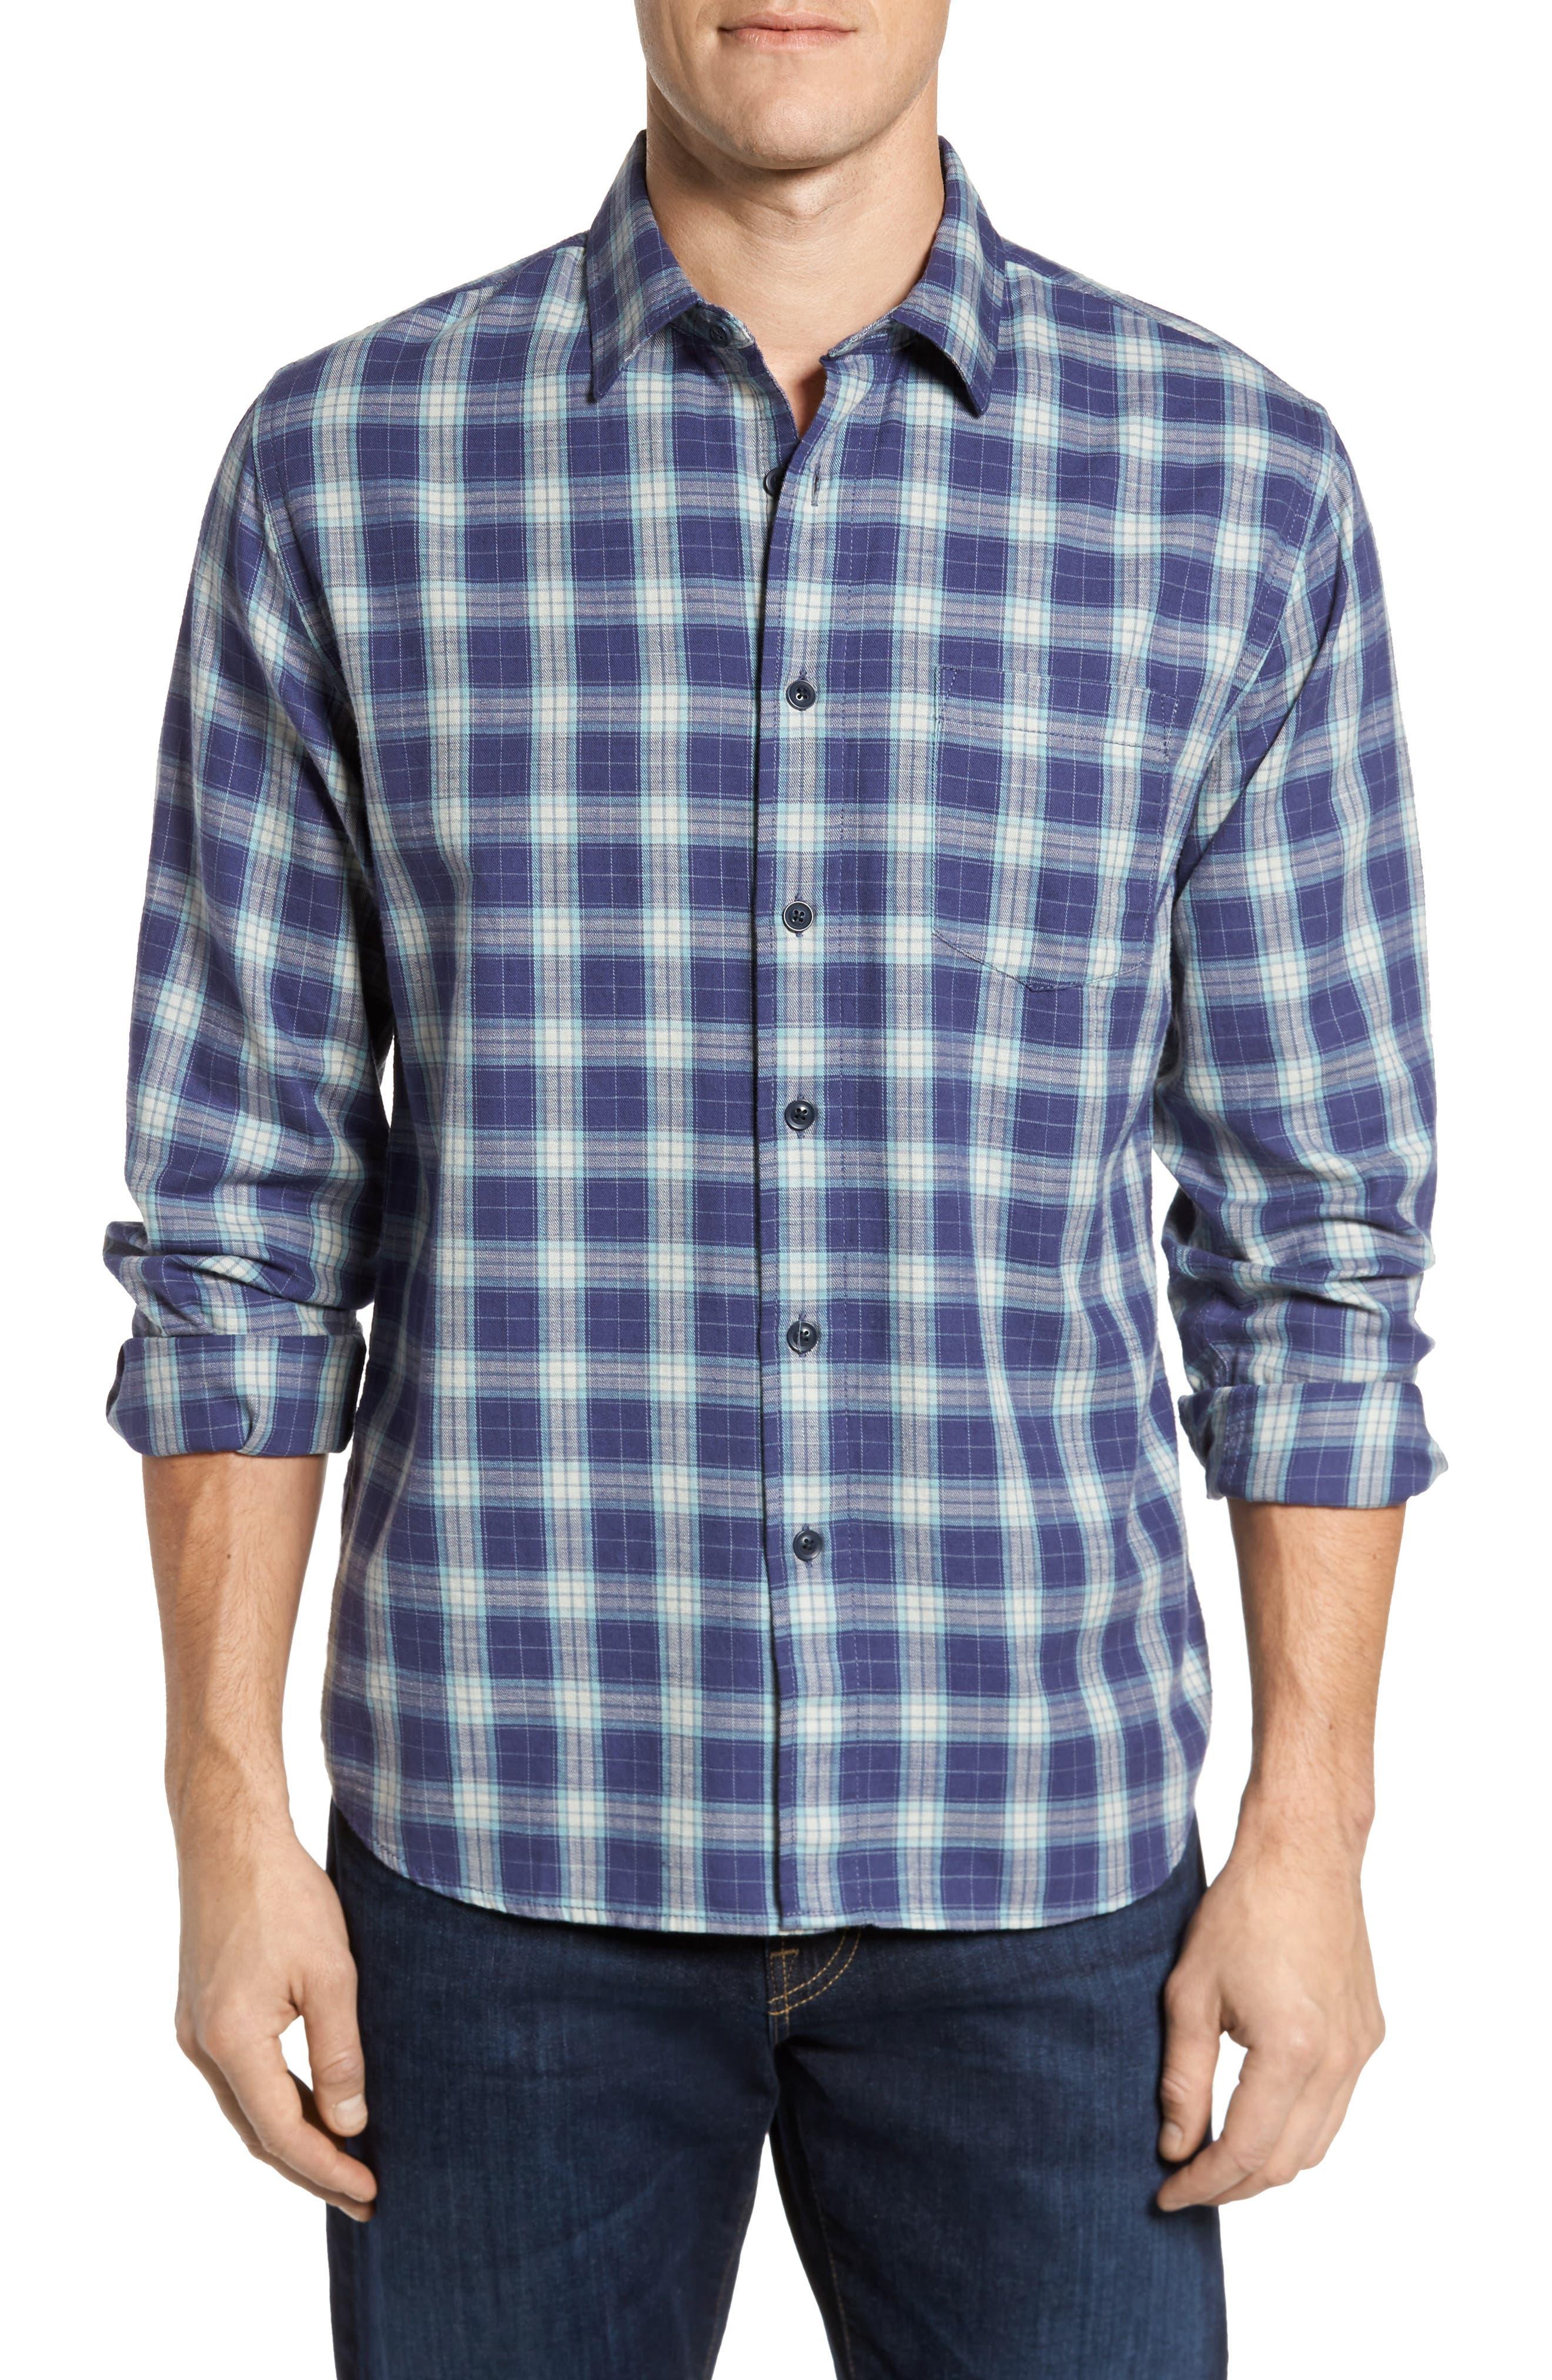 Walden Slim Fit Plaid Slub Twill Sport Shirt,                         Main,                         color, Seafoam